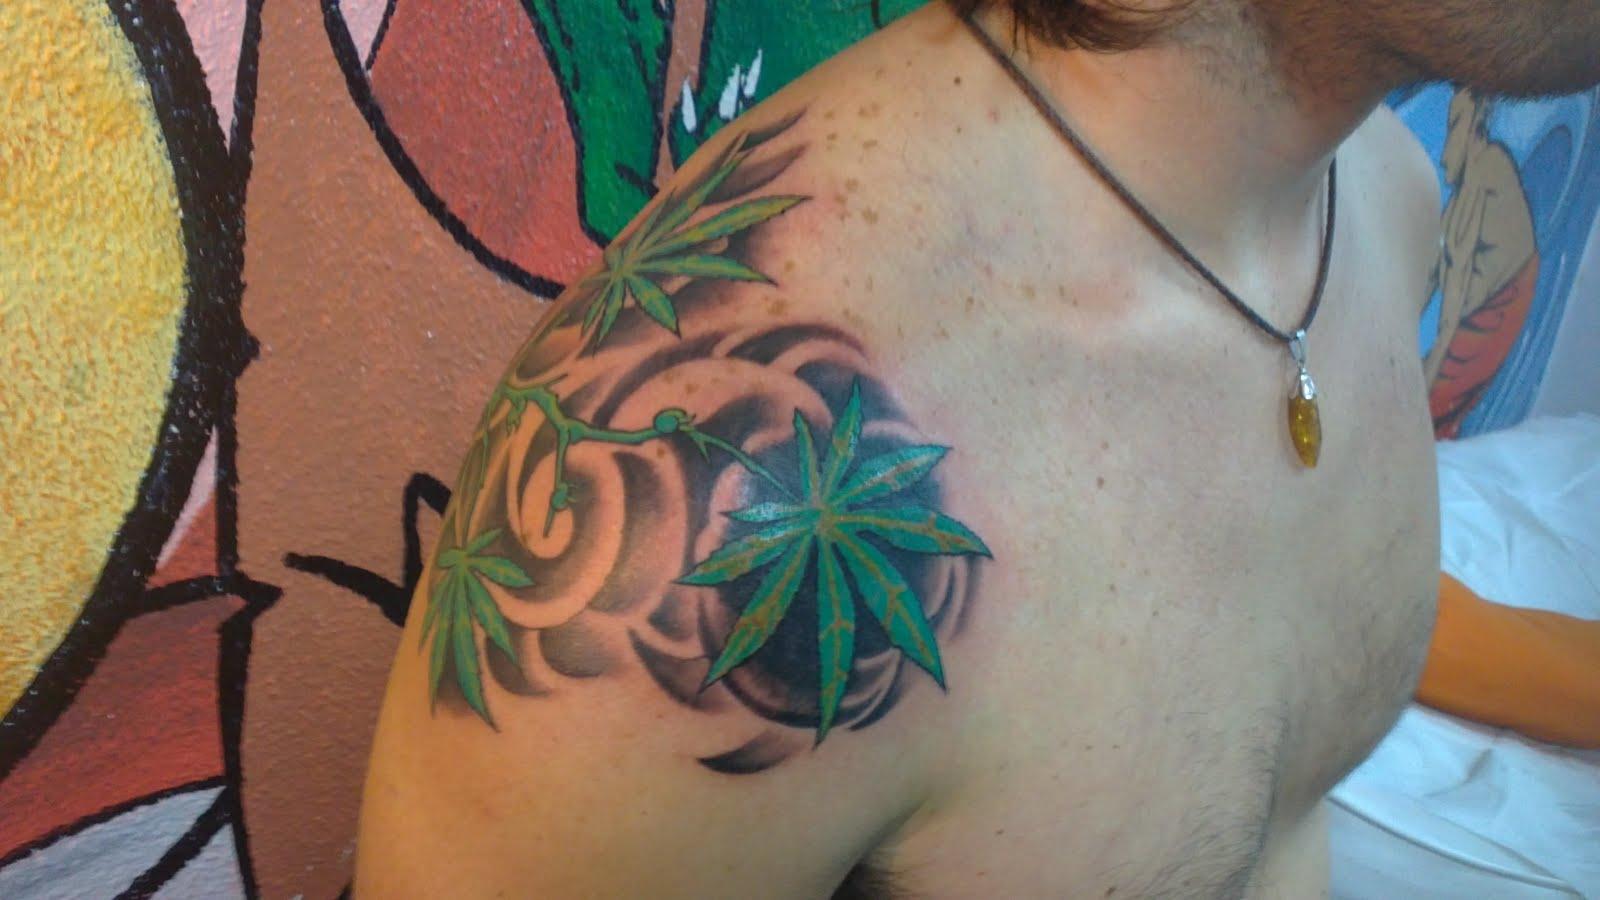 hojas de marihuana - cannabis leafs tattoo - tattoo folha de cannabis